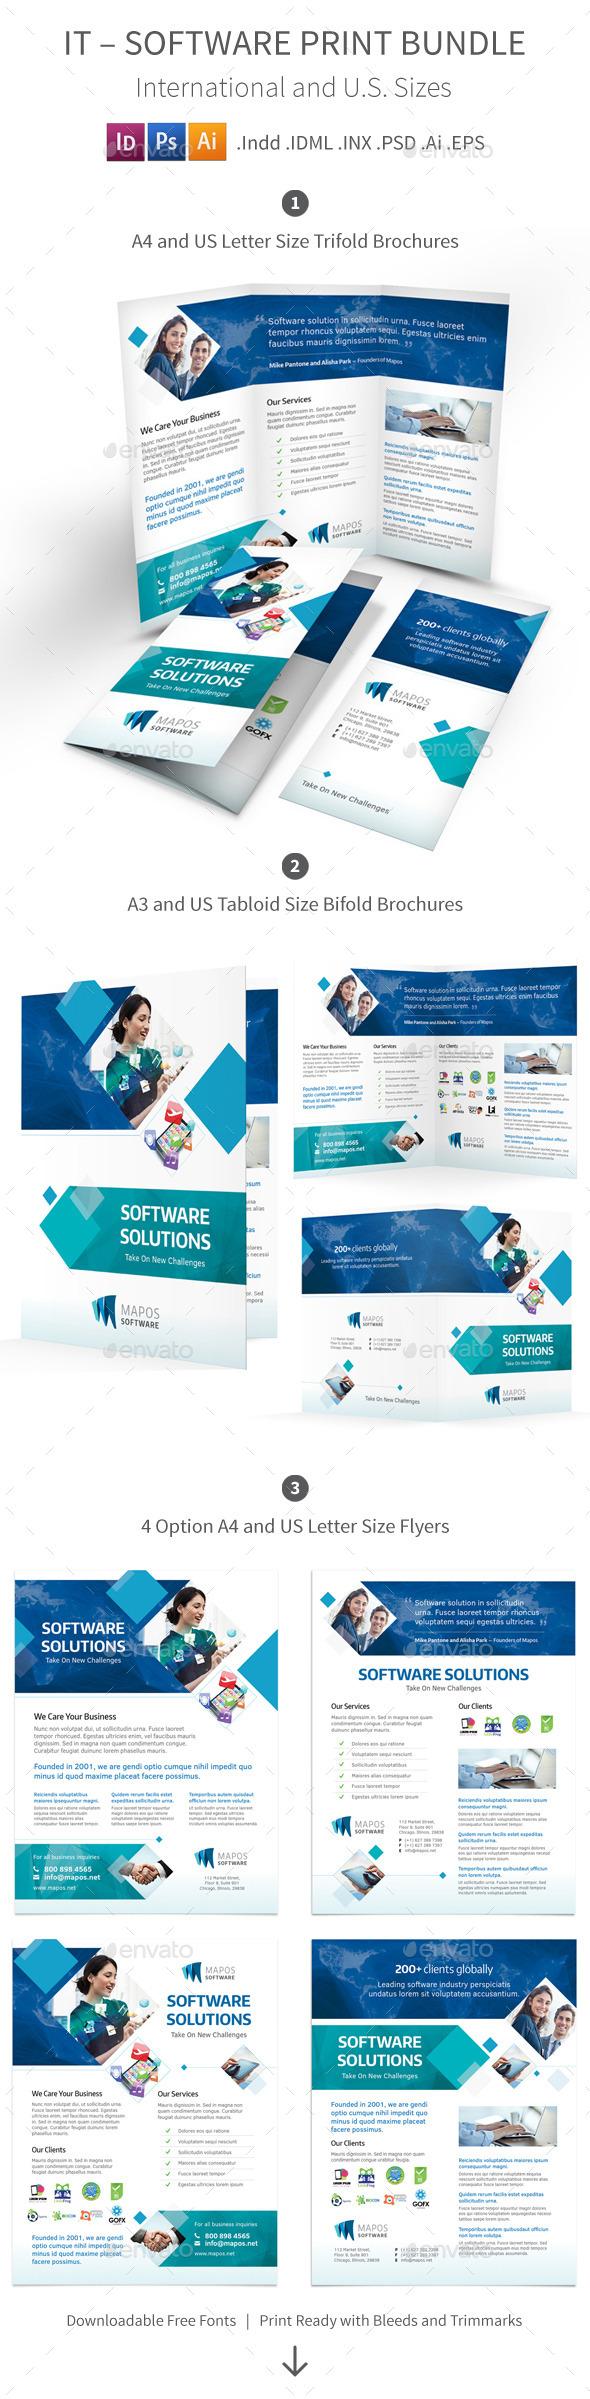 IT – Software Print Bundle - Informational Brochures